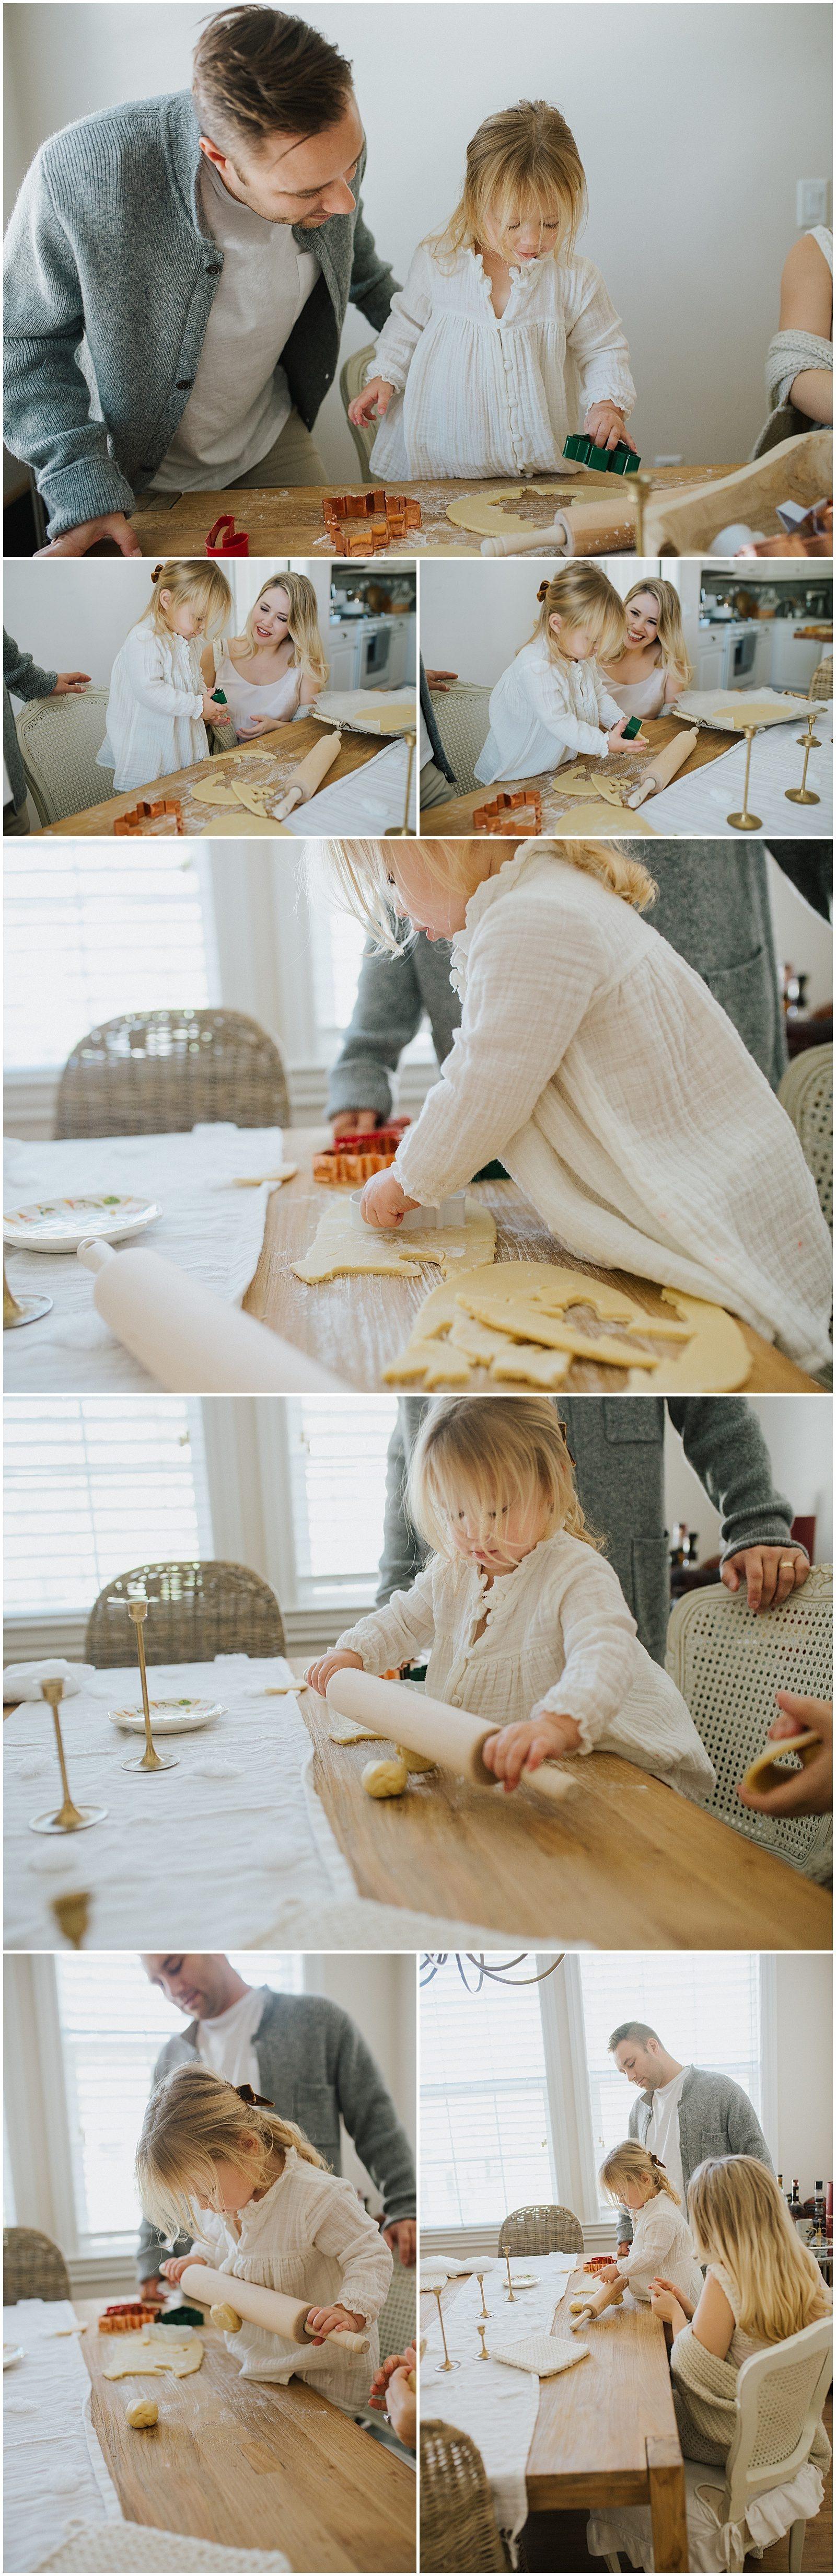 Orange County Family Lifestyle Photographer Sonja Hammad Photography 0125